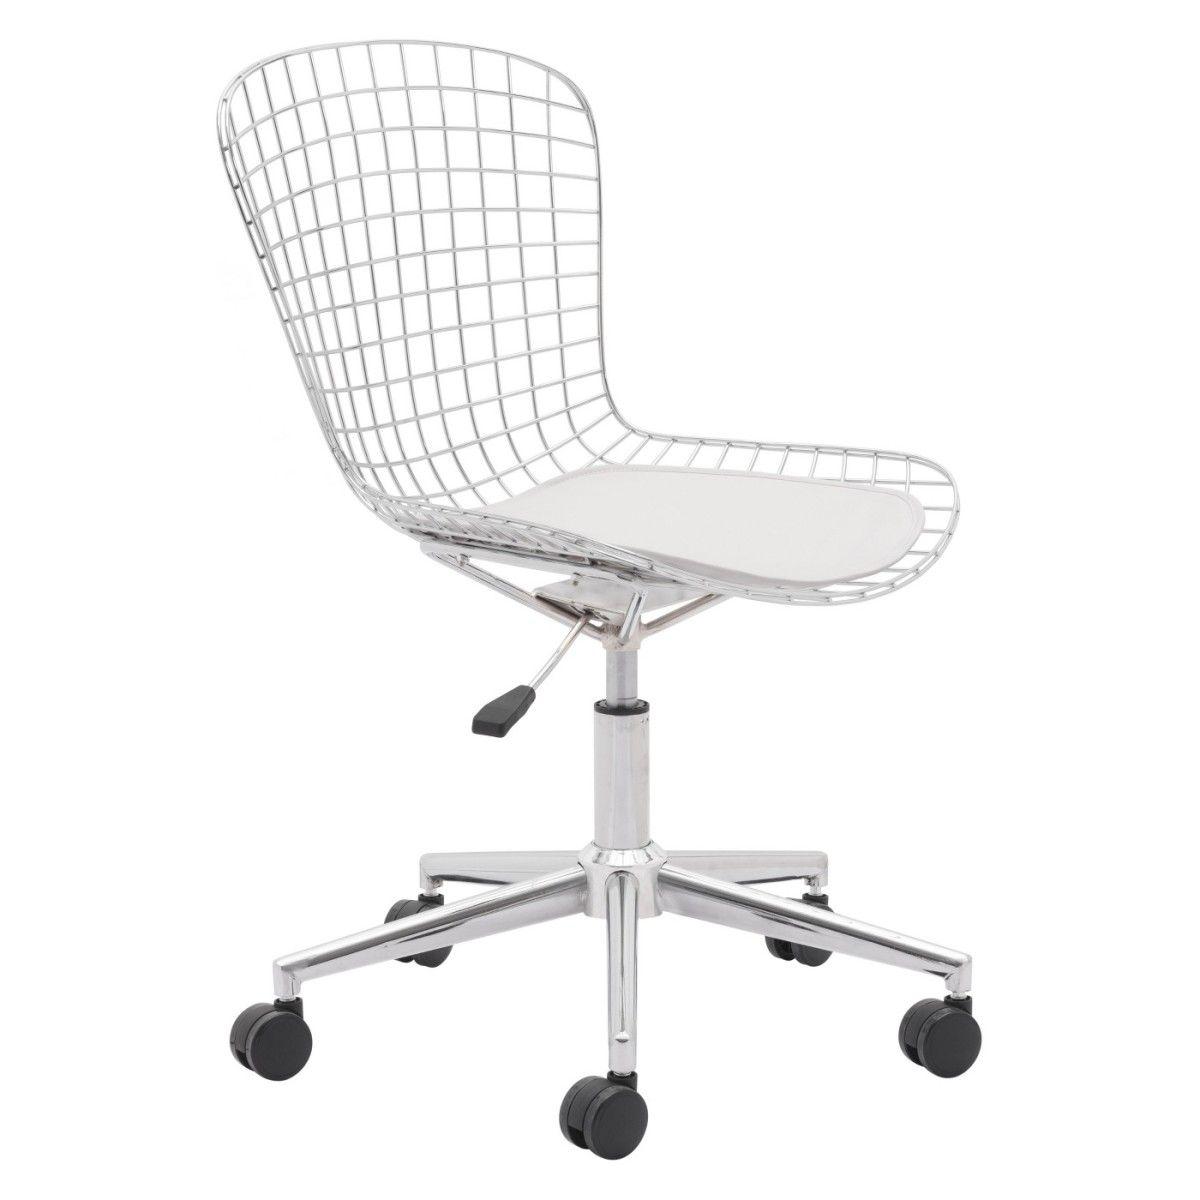 Target Grid Desk Chair Modern Office Chair White Office Chair